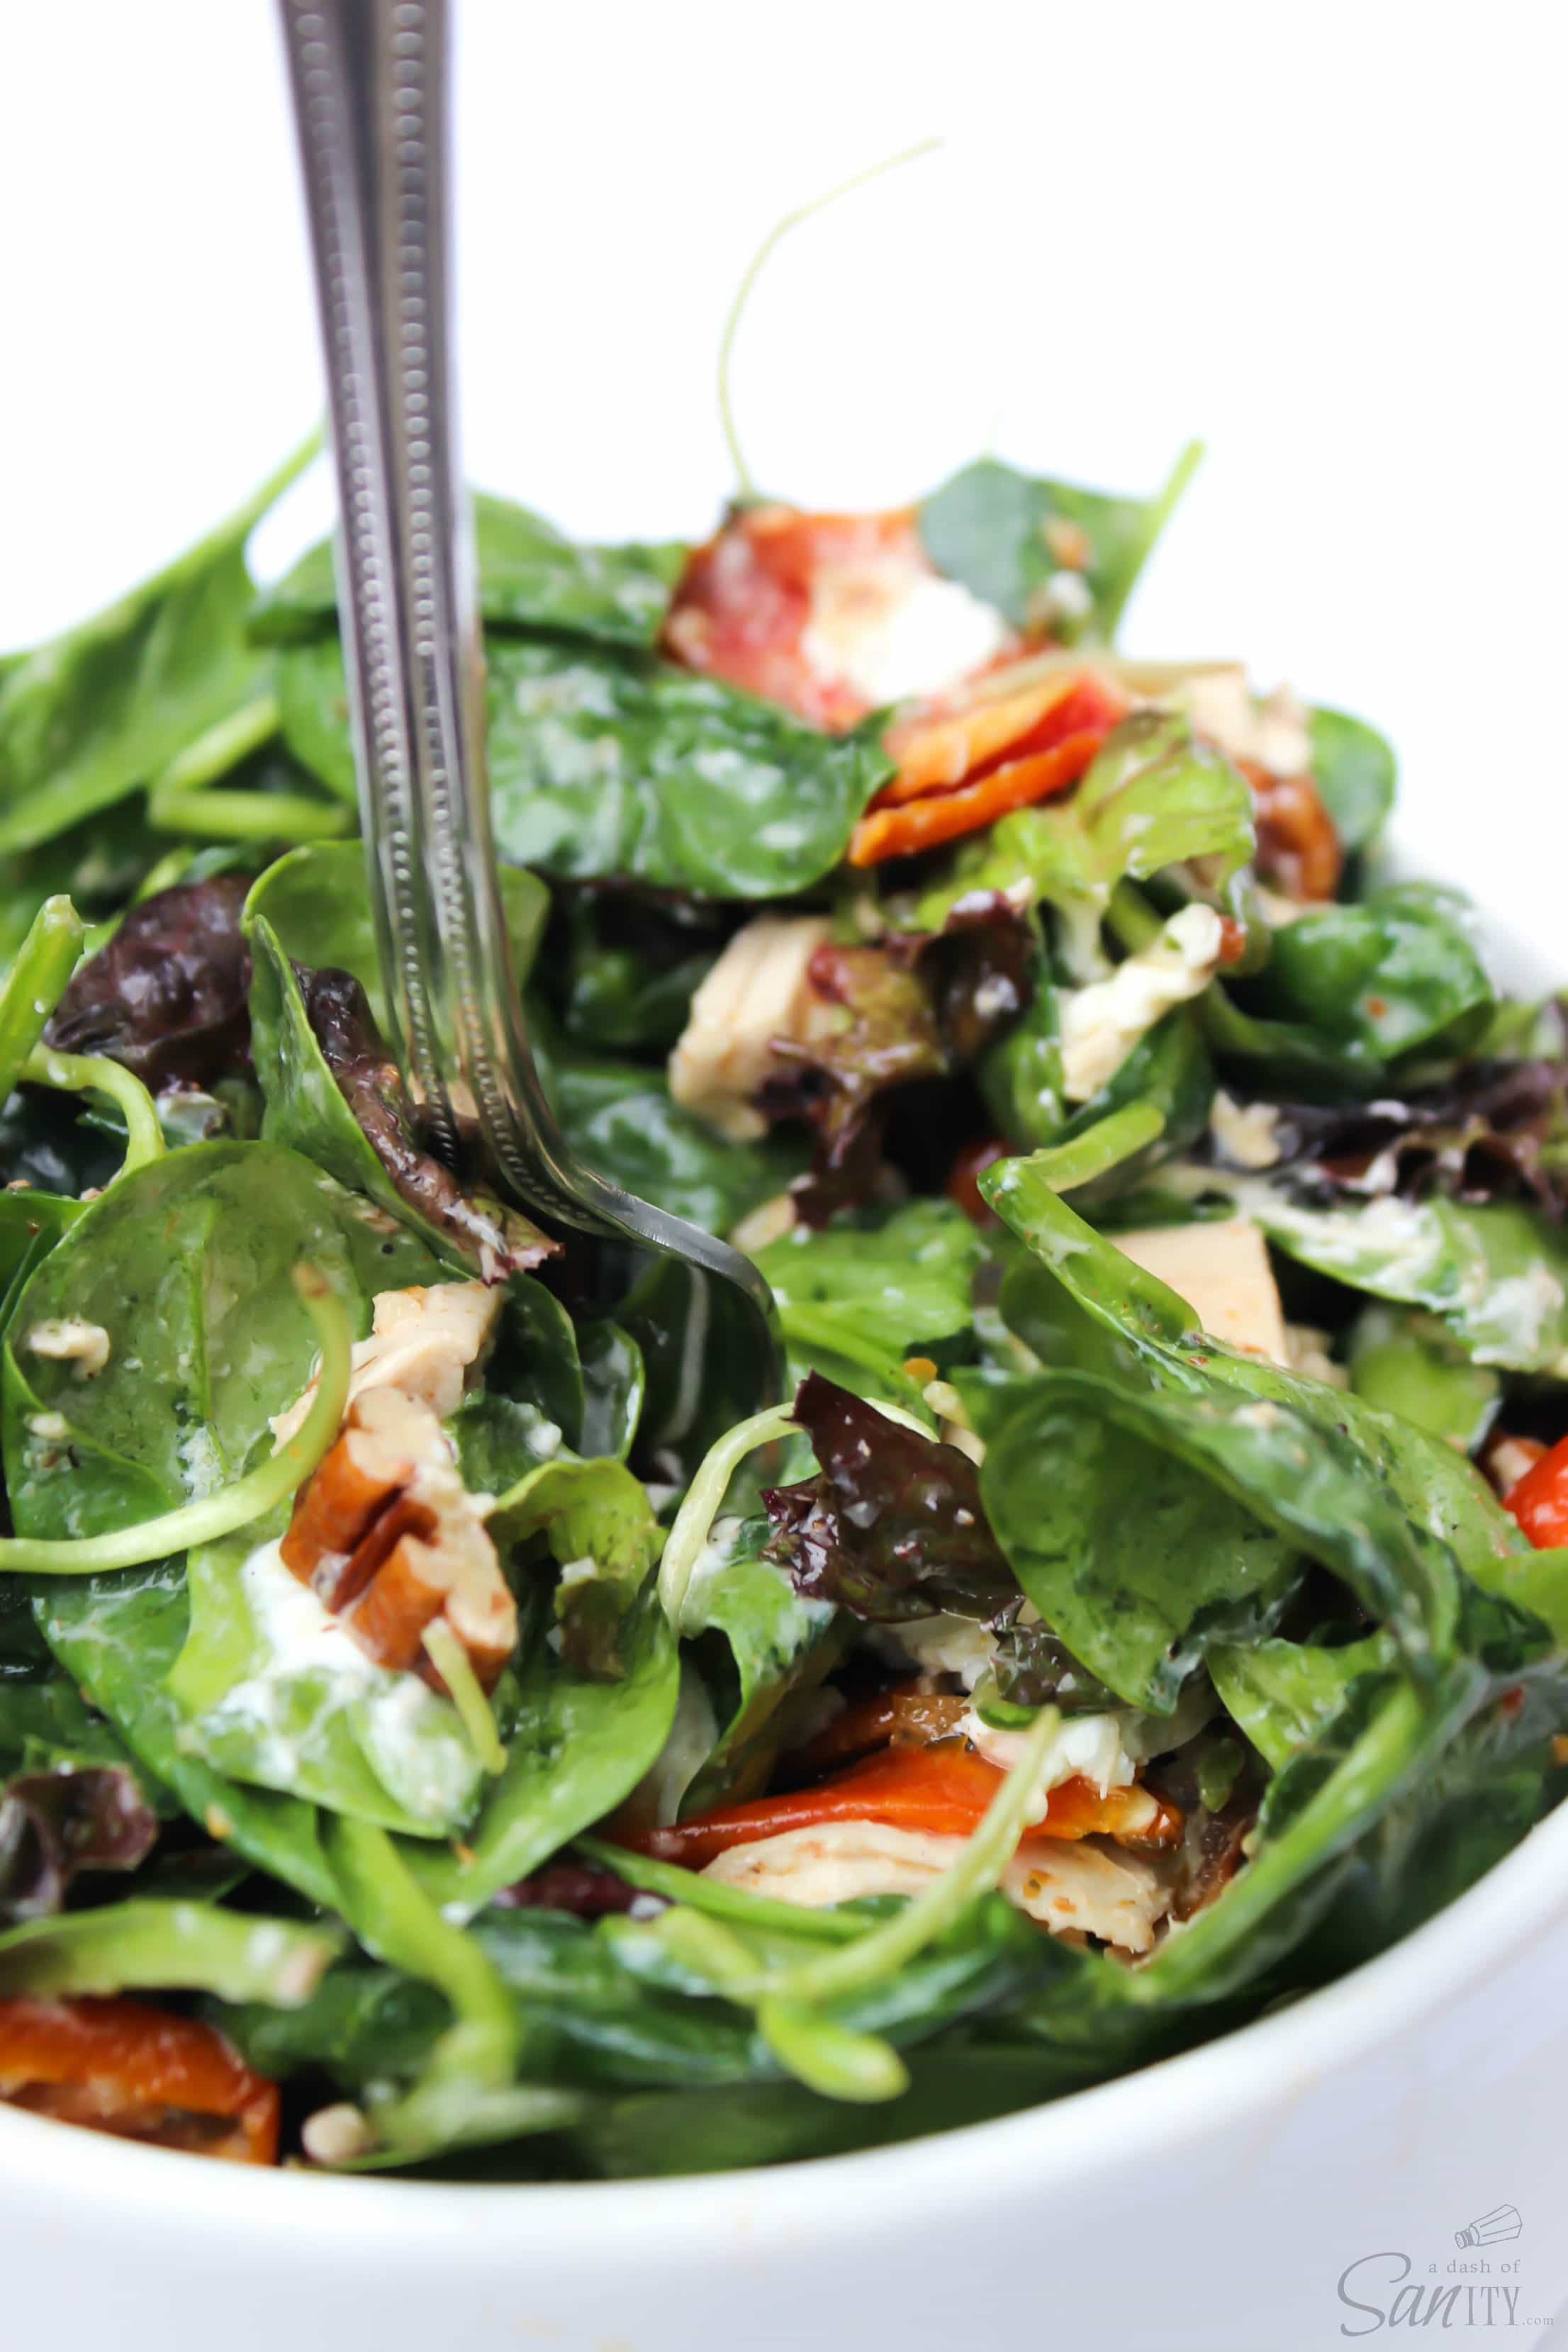 Chicken Spinach Salad  Chicken & Spinach Salad with Lemon Vinaigrette